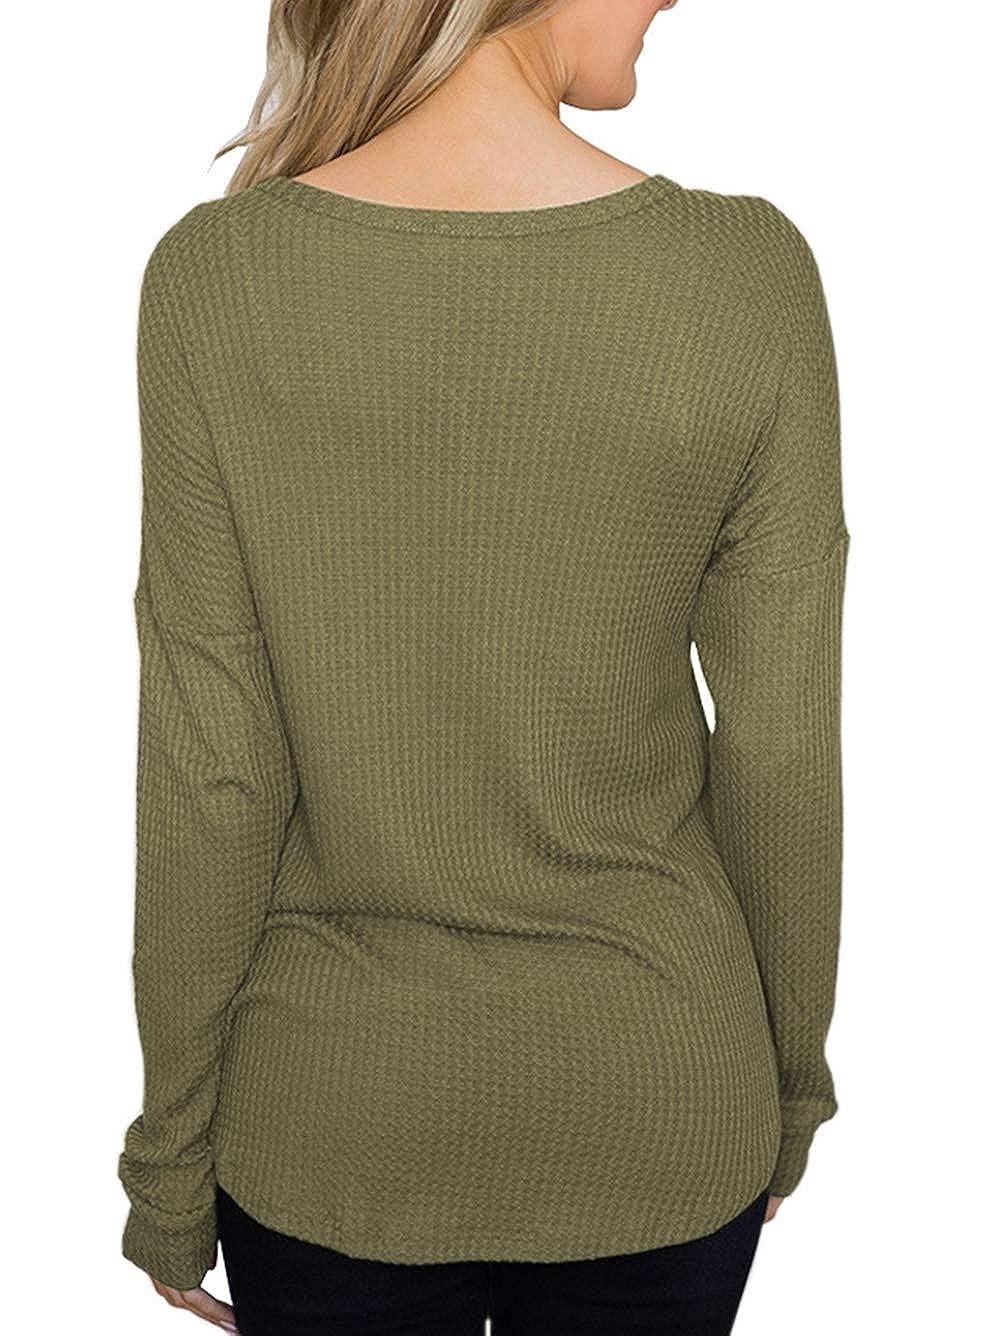 bc56d3dda97 Famulily Women's Waffle Thermal Knit Top Casual V Neck Loose Long Sleeve  Tunic Shirt at Amazon Women's Clothing store: